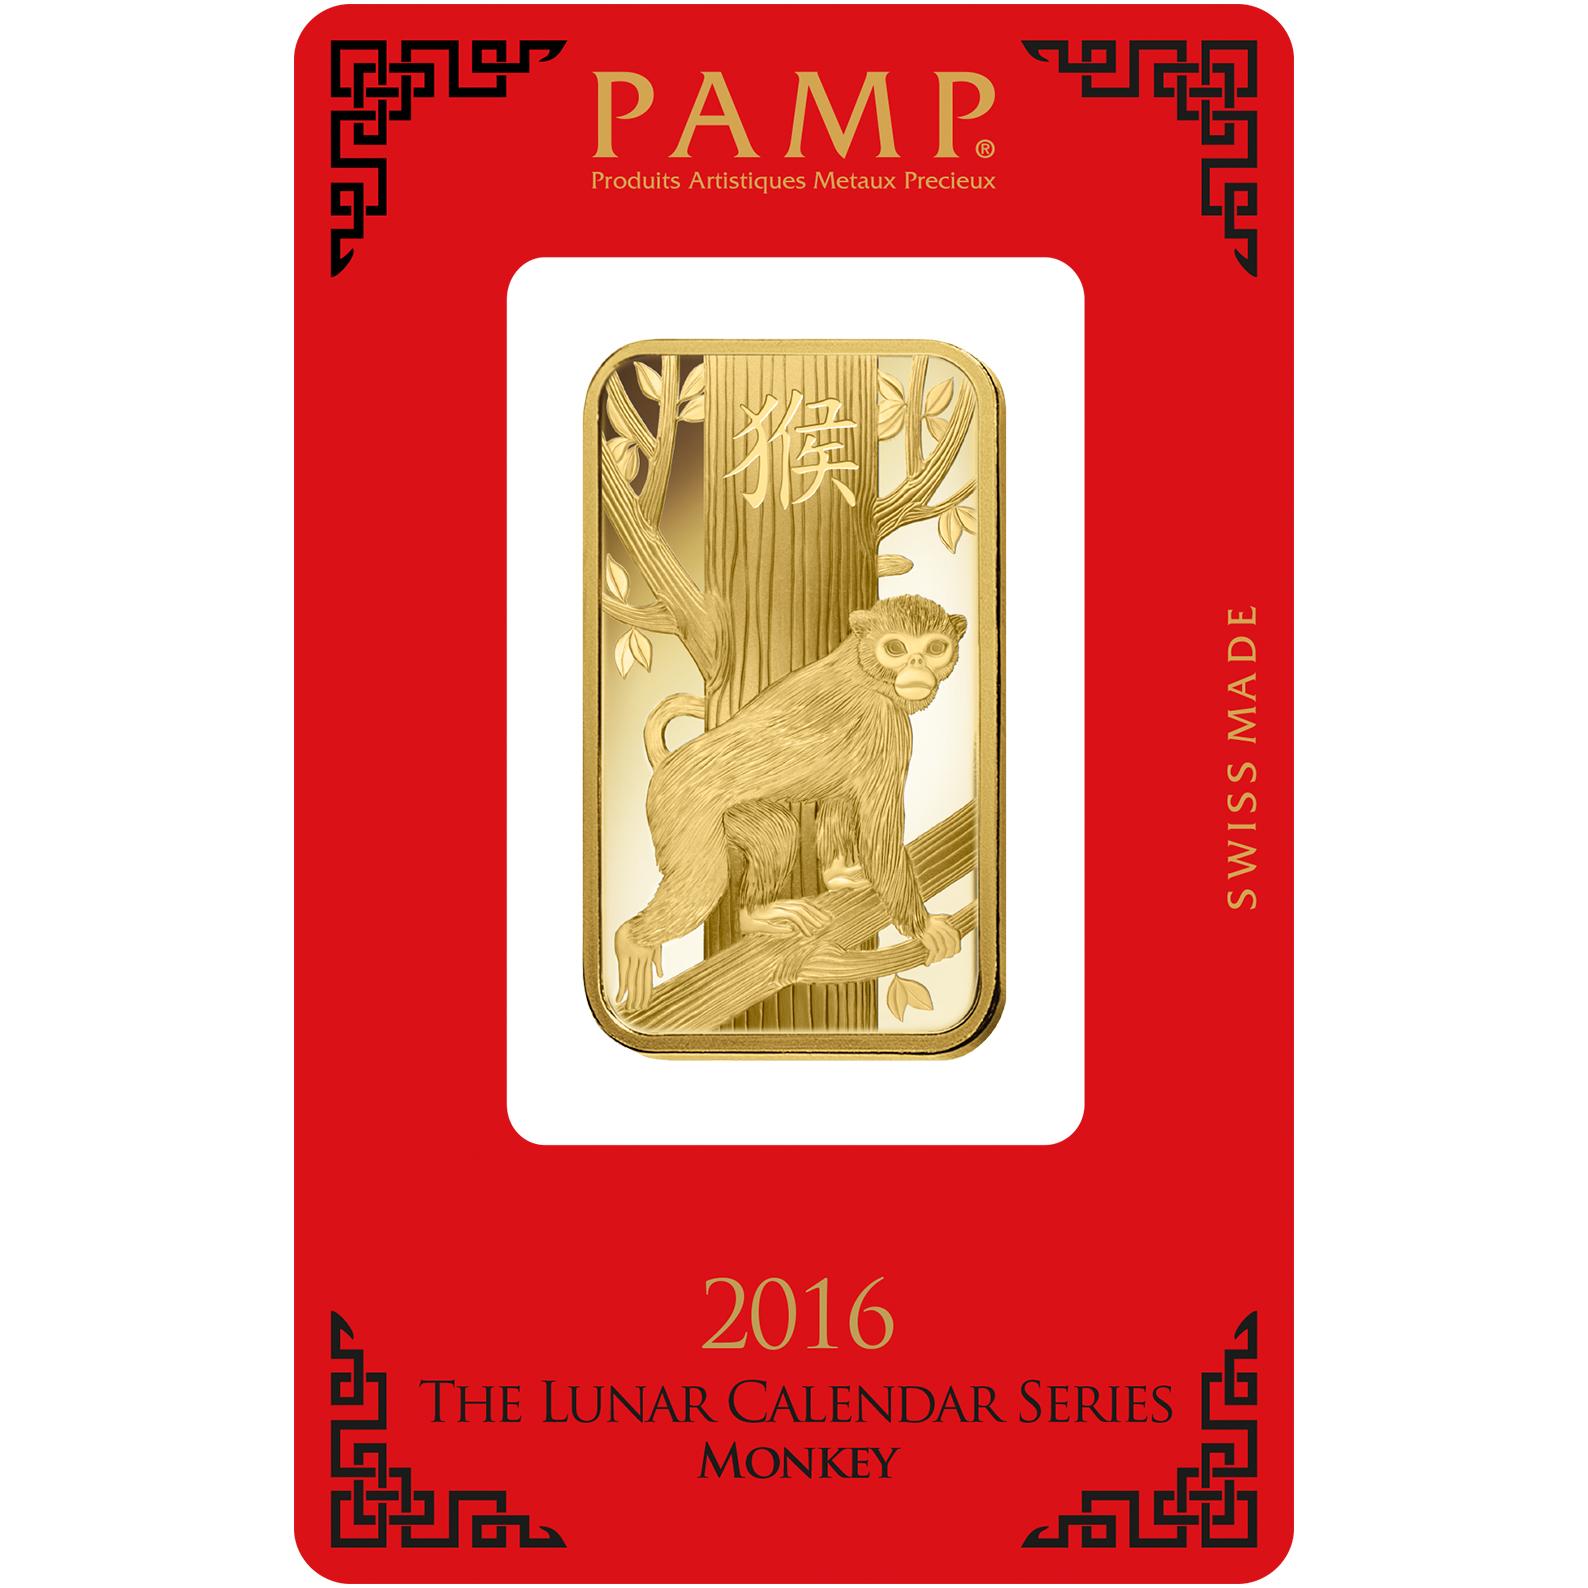 Lingotin d'or de 1 once - PAMP Suisse Lunar Singe